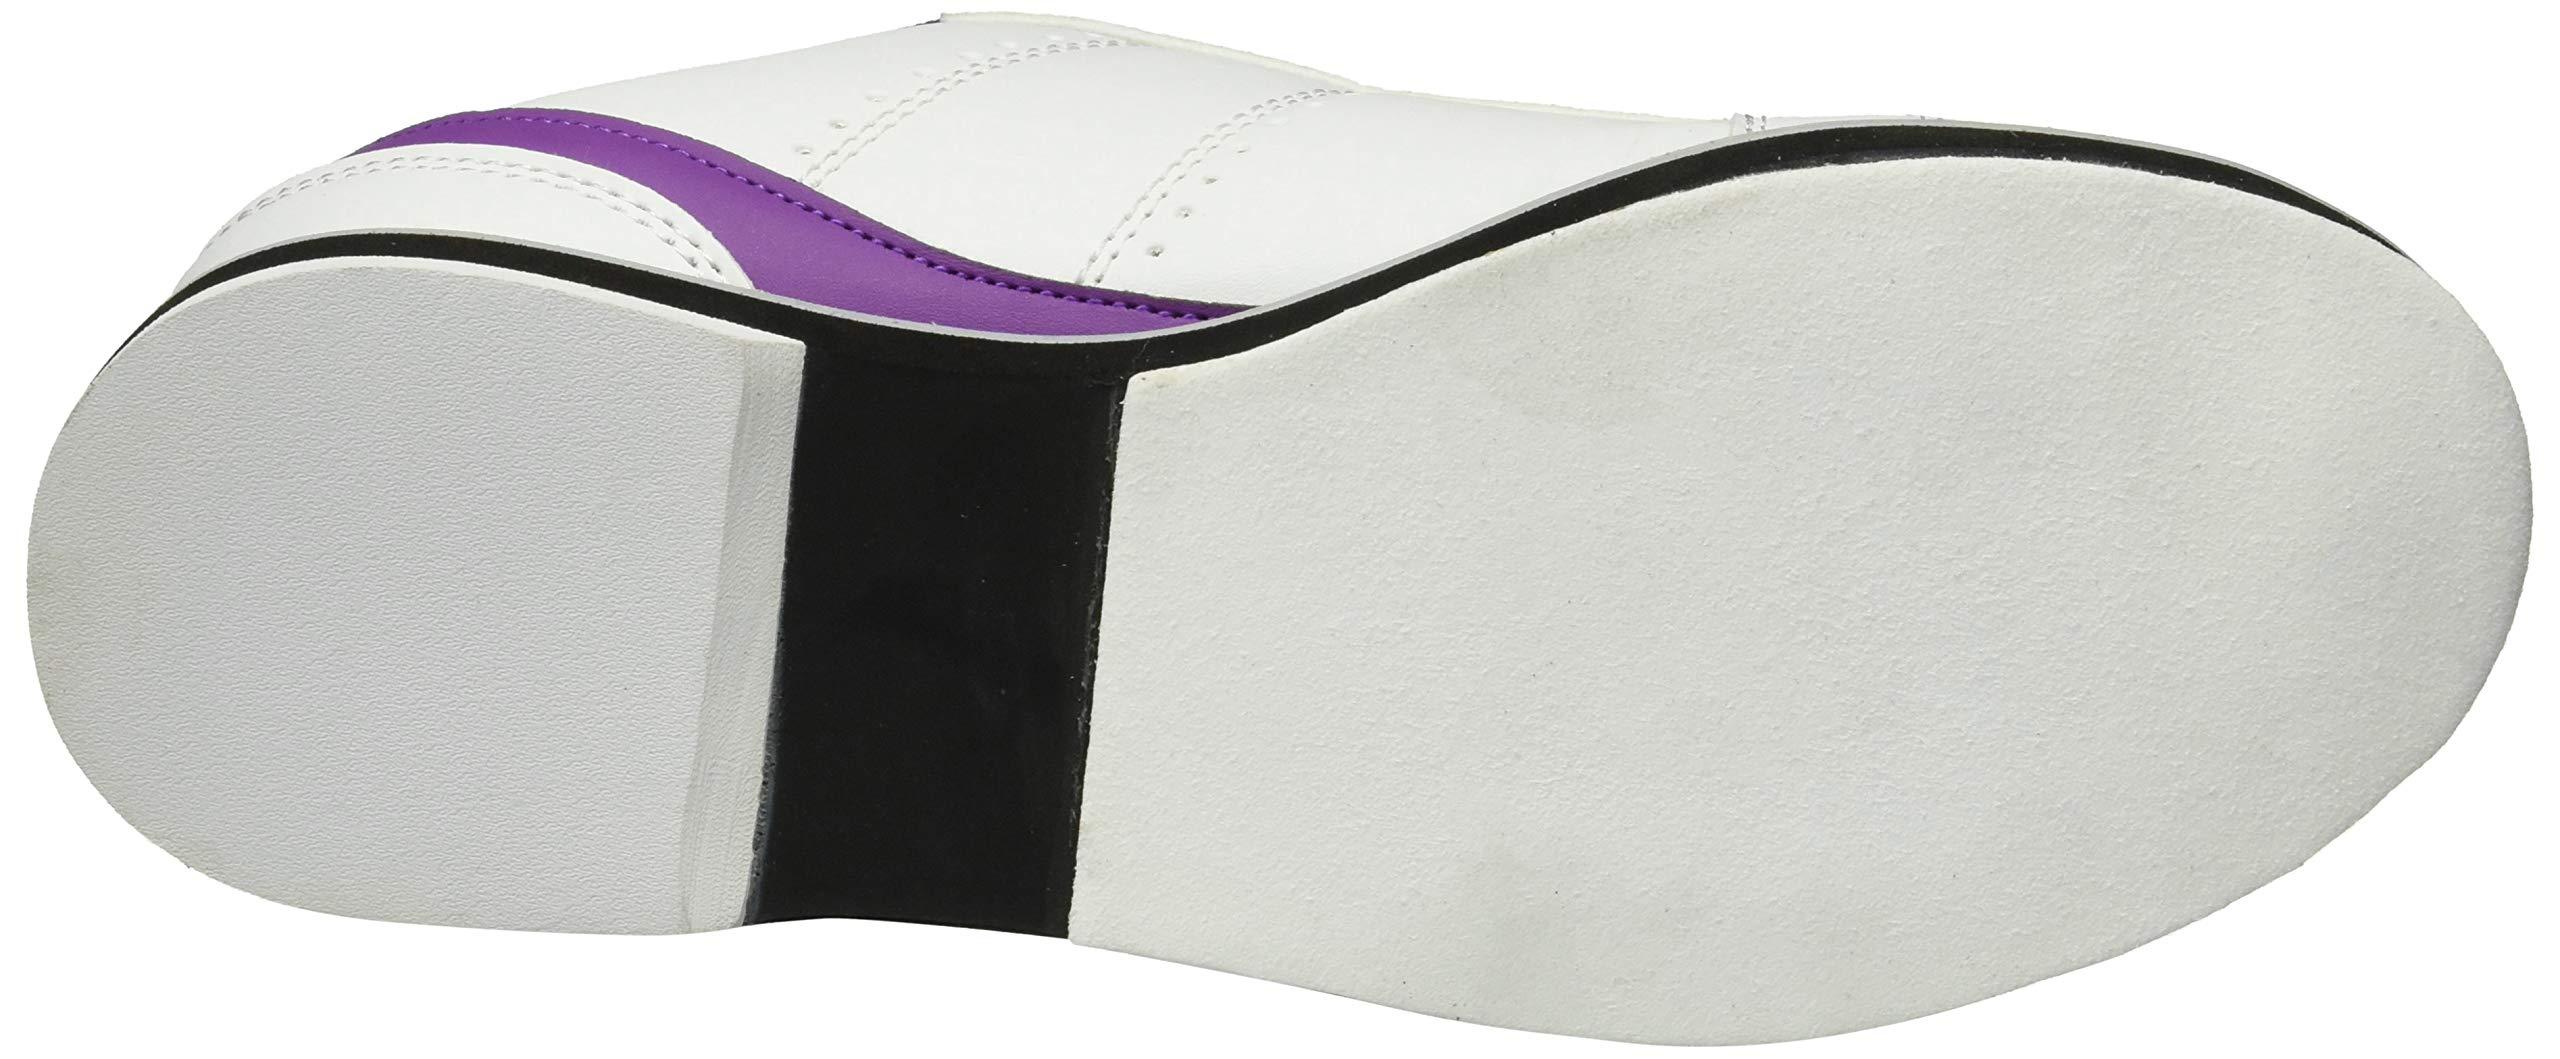 BSI Women's 460 Bowling Shoe, White/Purple, Size 10 by BSI (Image #3)